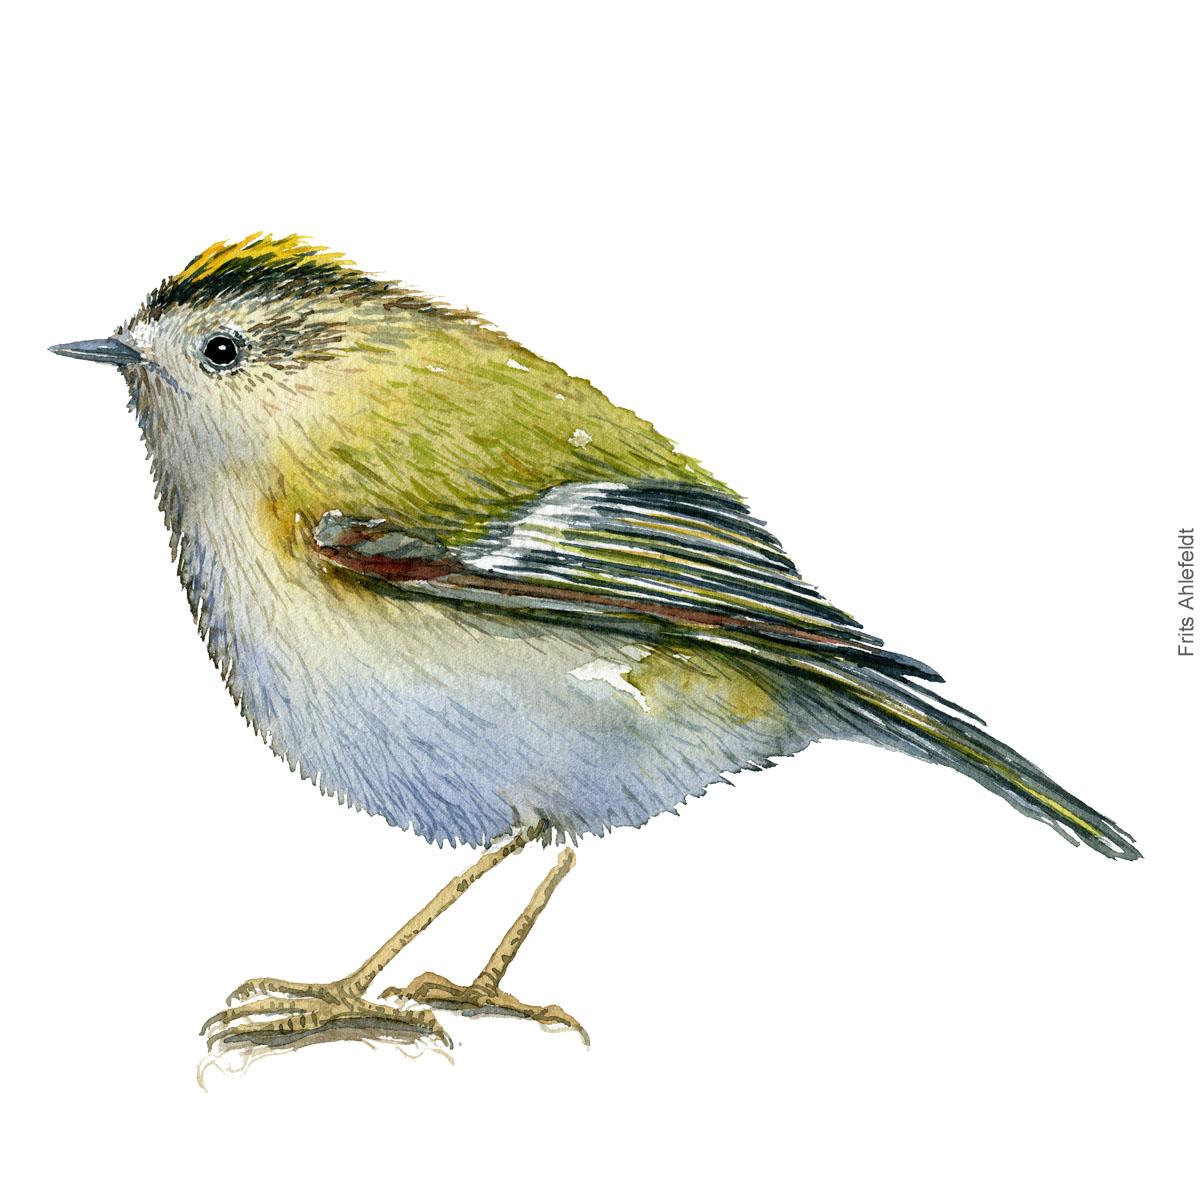 Goldcrest - Fuglekonge. akvarel. Watercolor painting by Frits Ahlefeldt